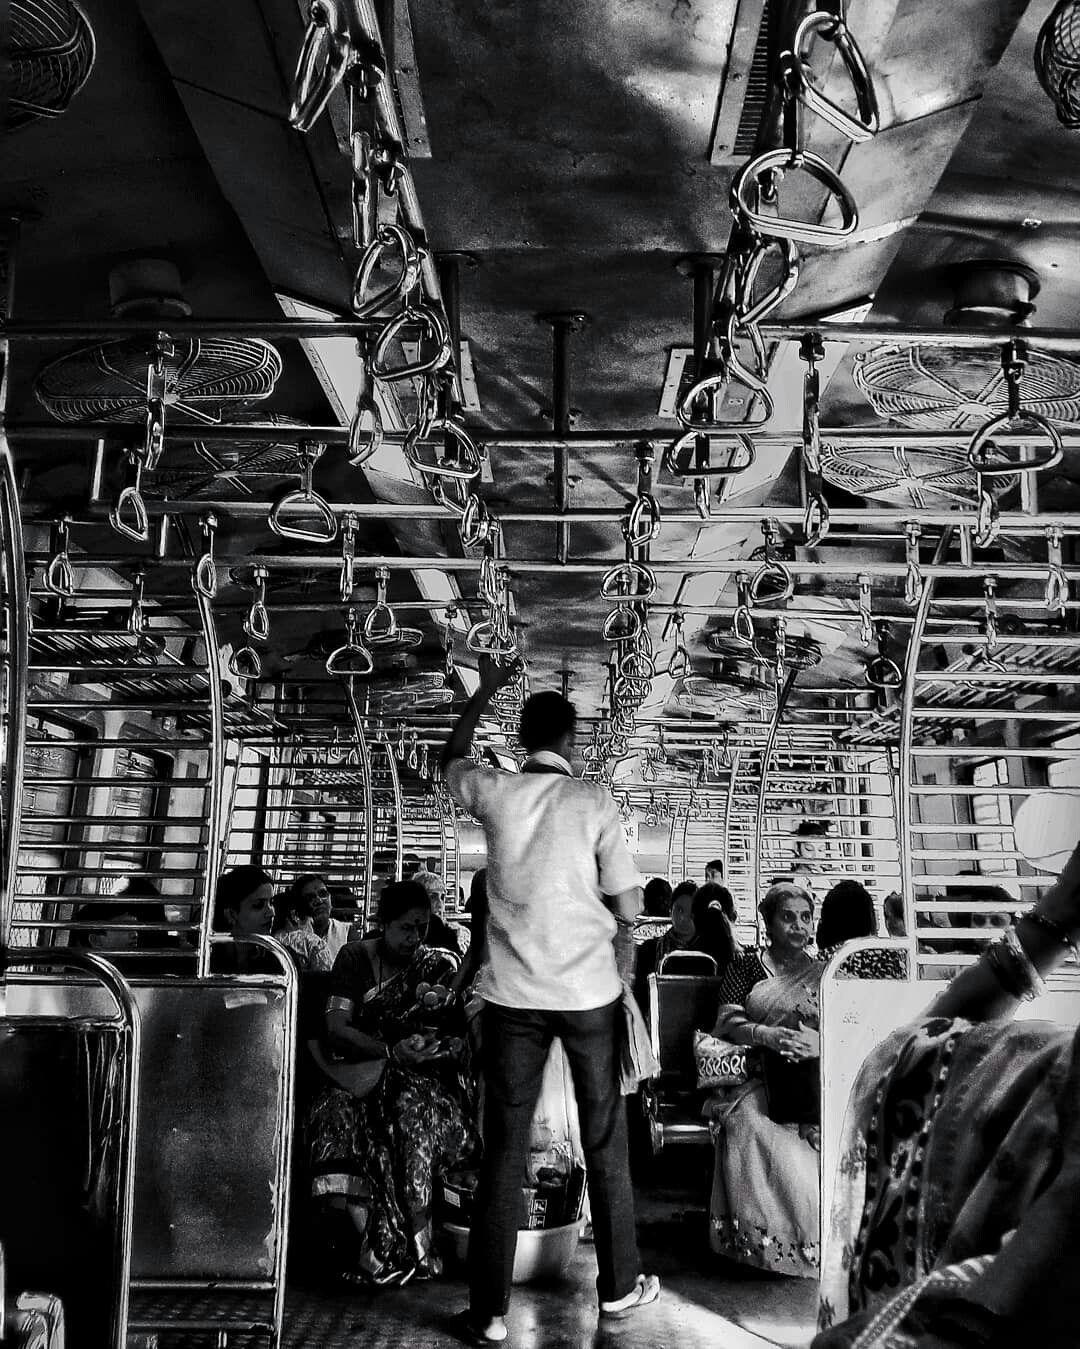 mumbai local trains   Train photography, Mumbai city, City photography